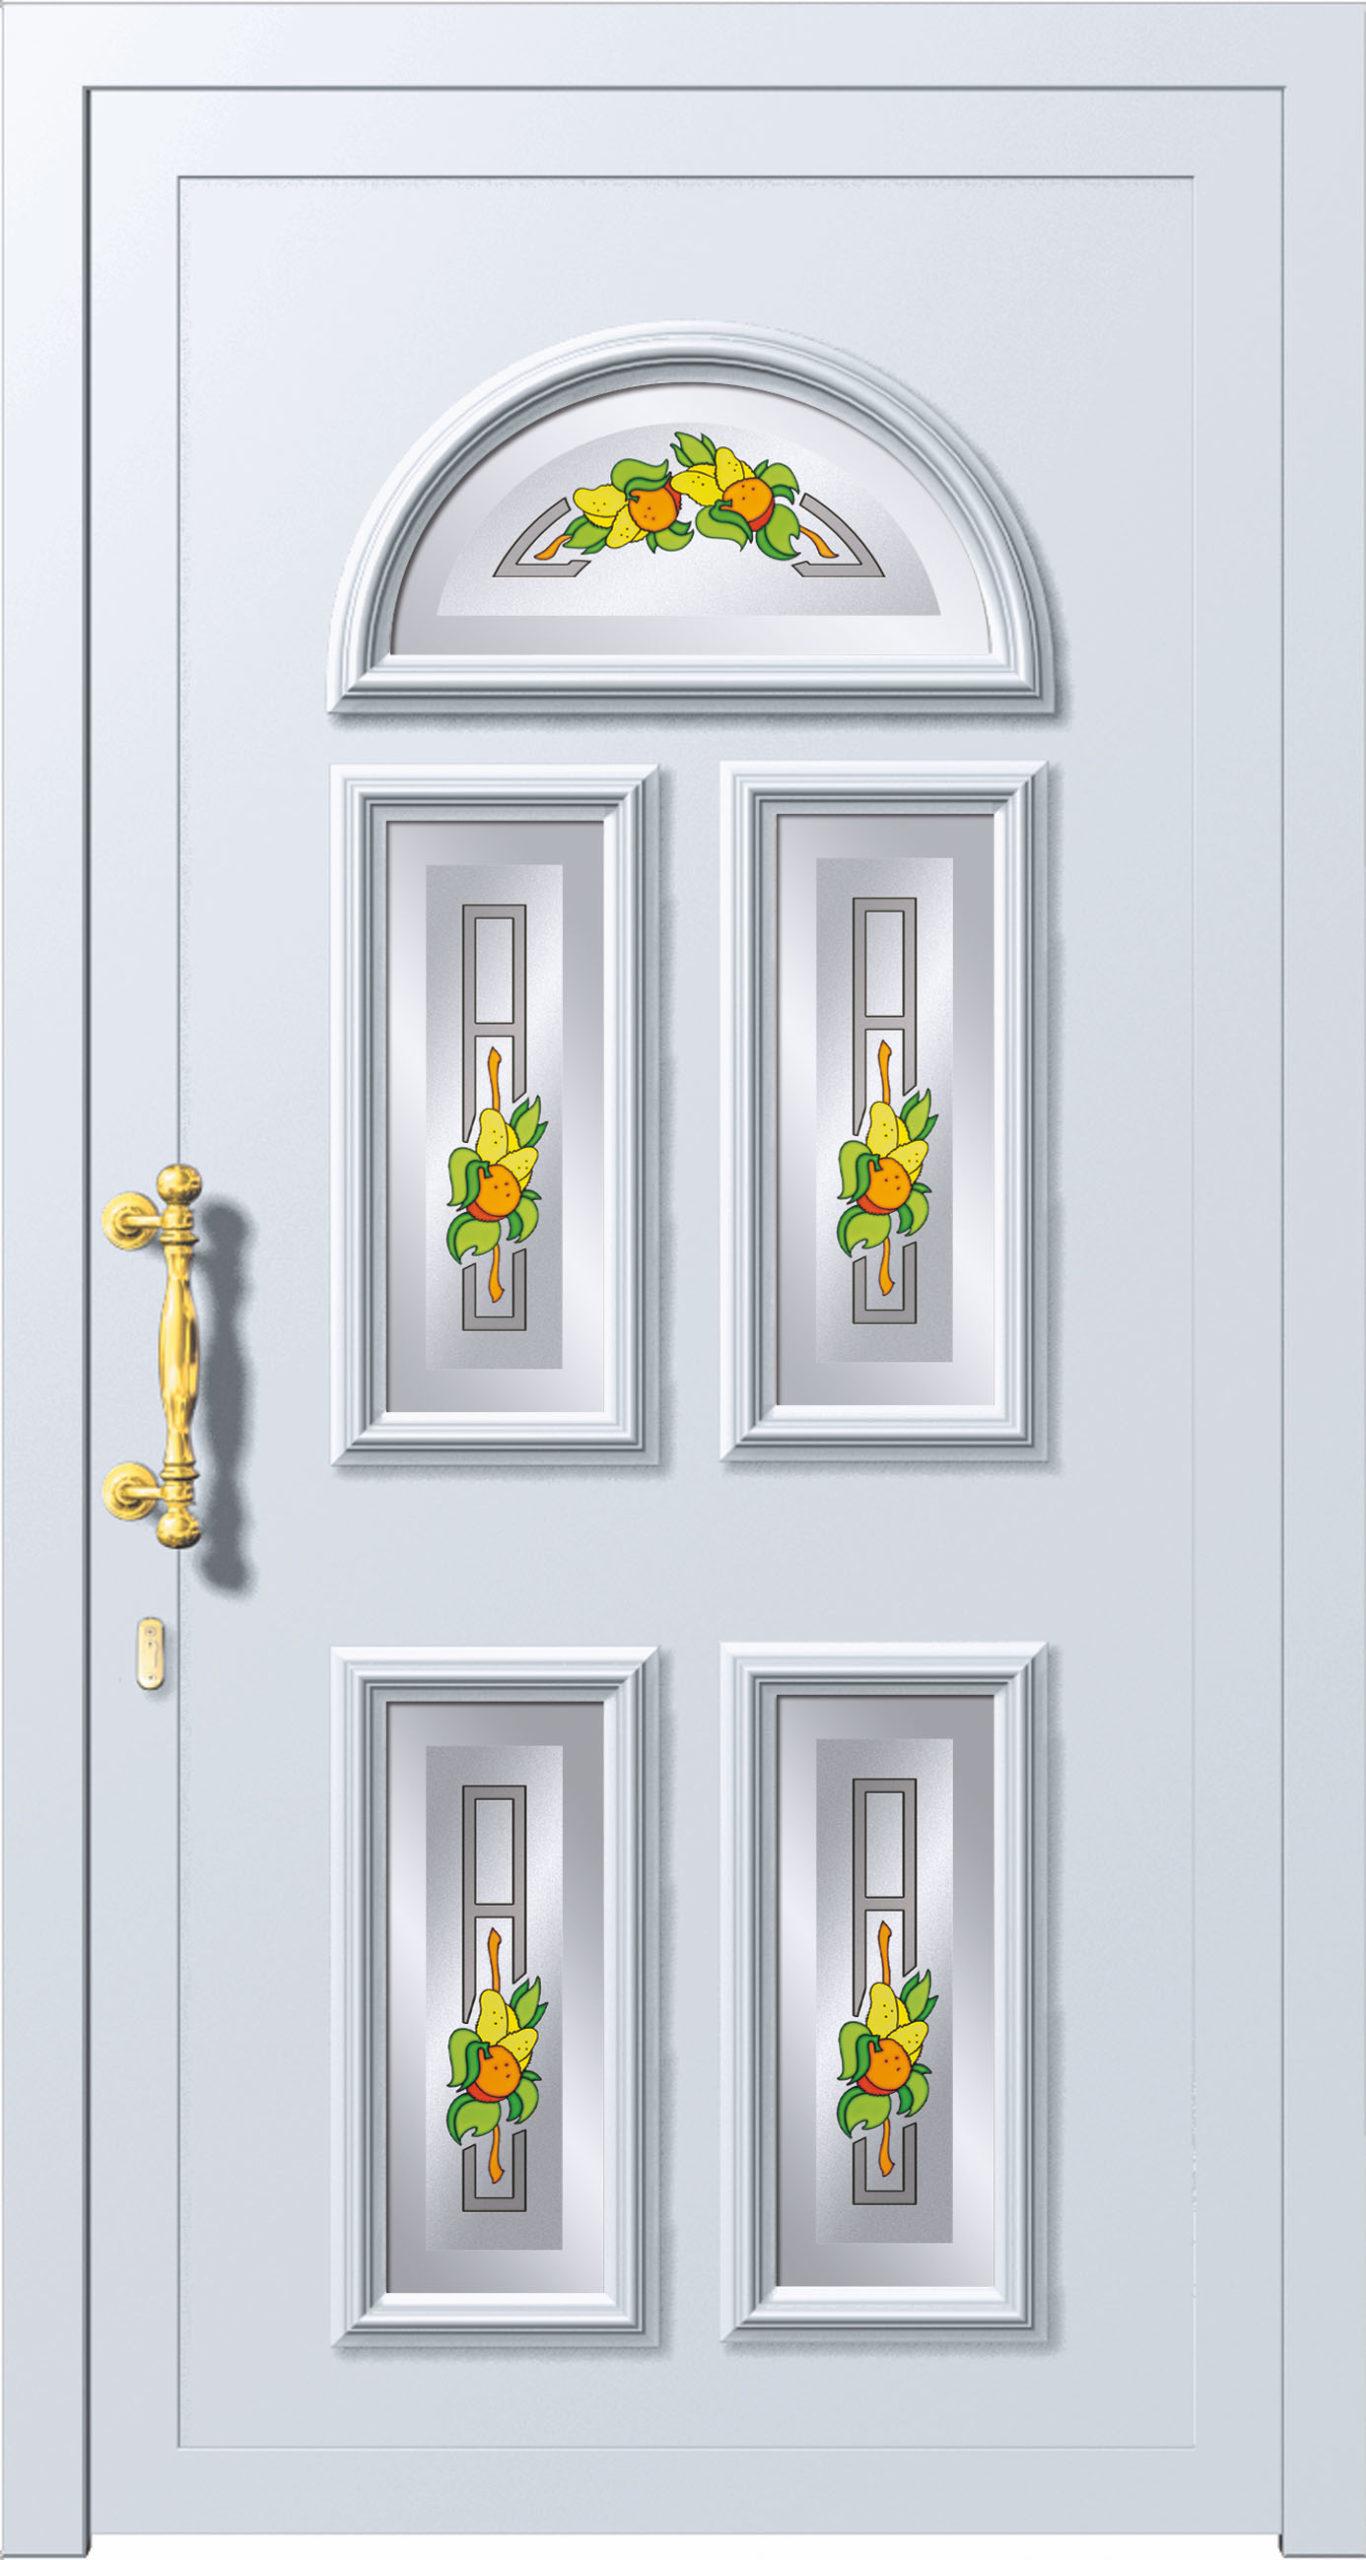 Entry Doors Linea Classica 34